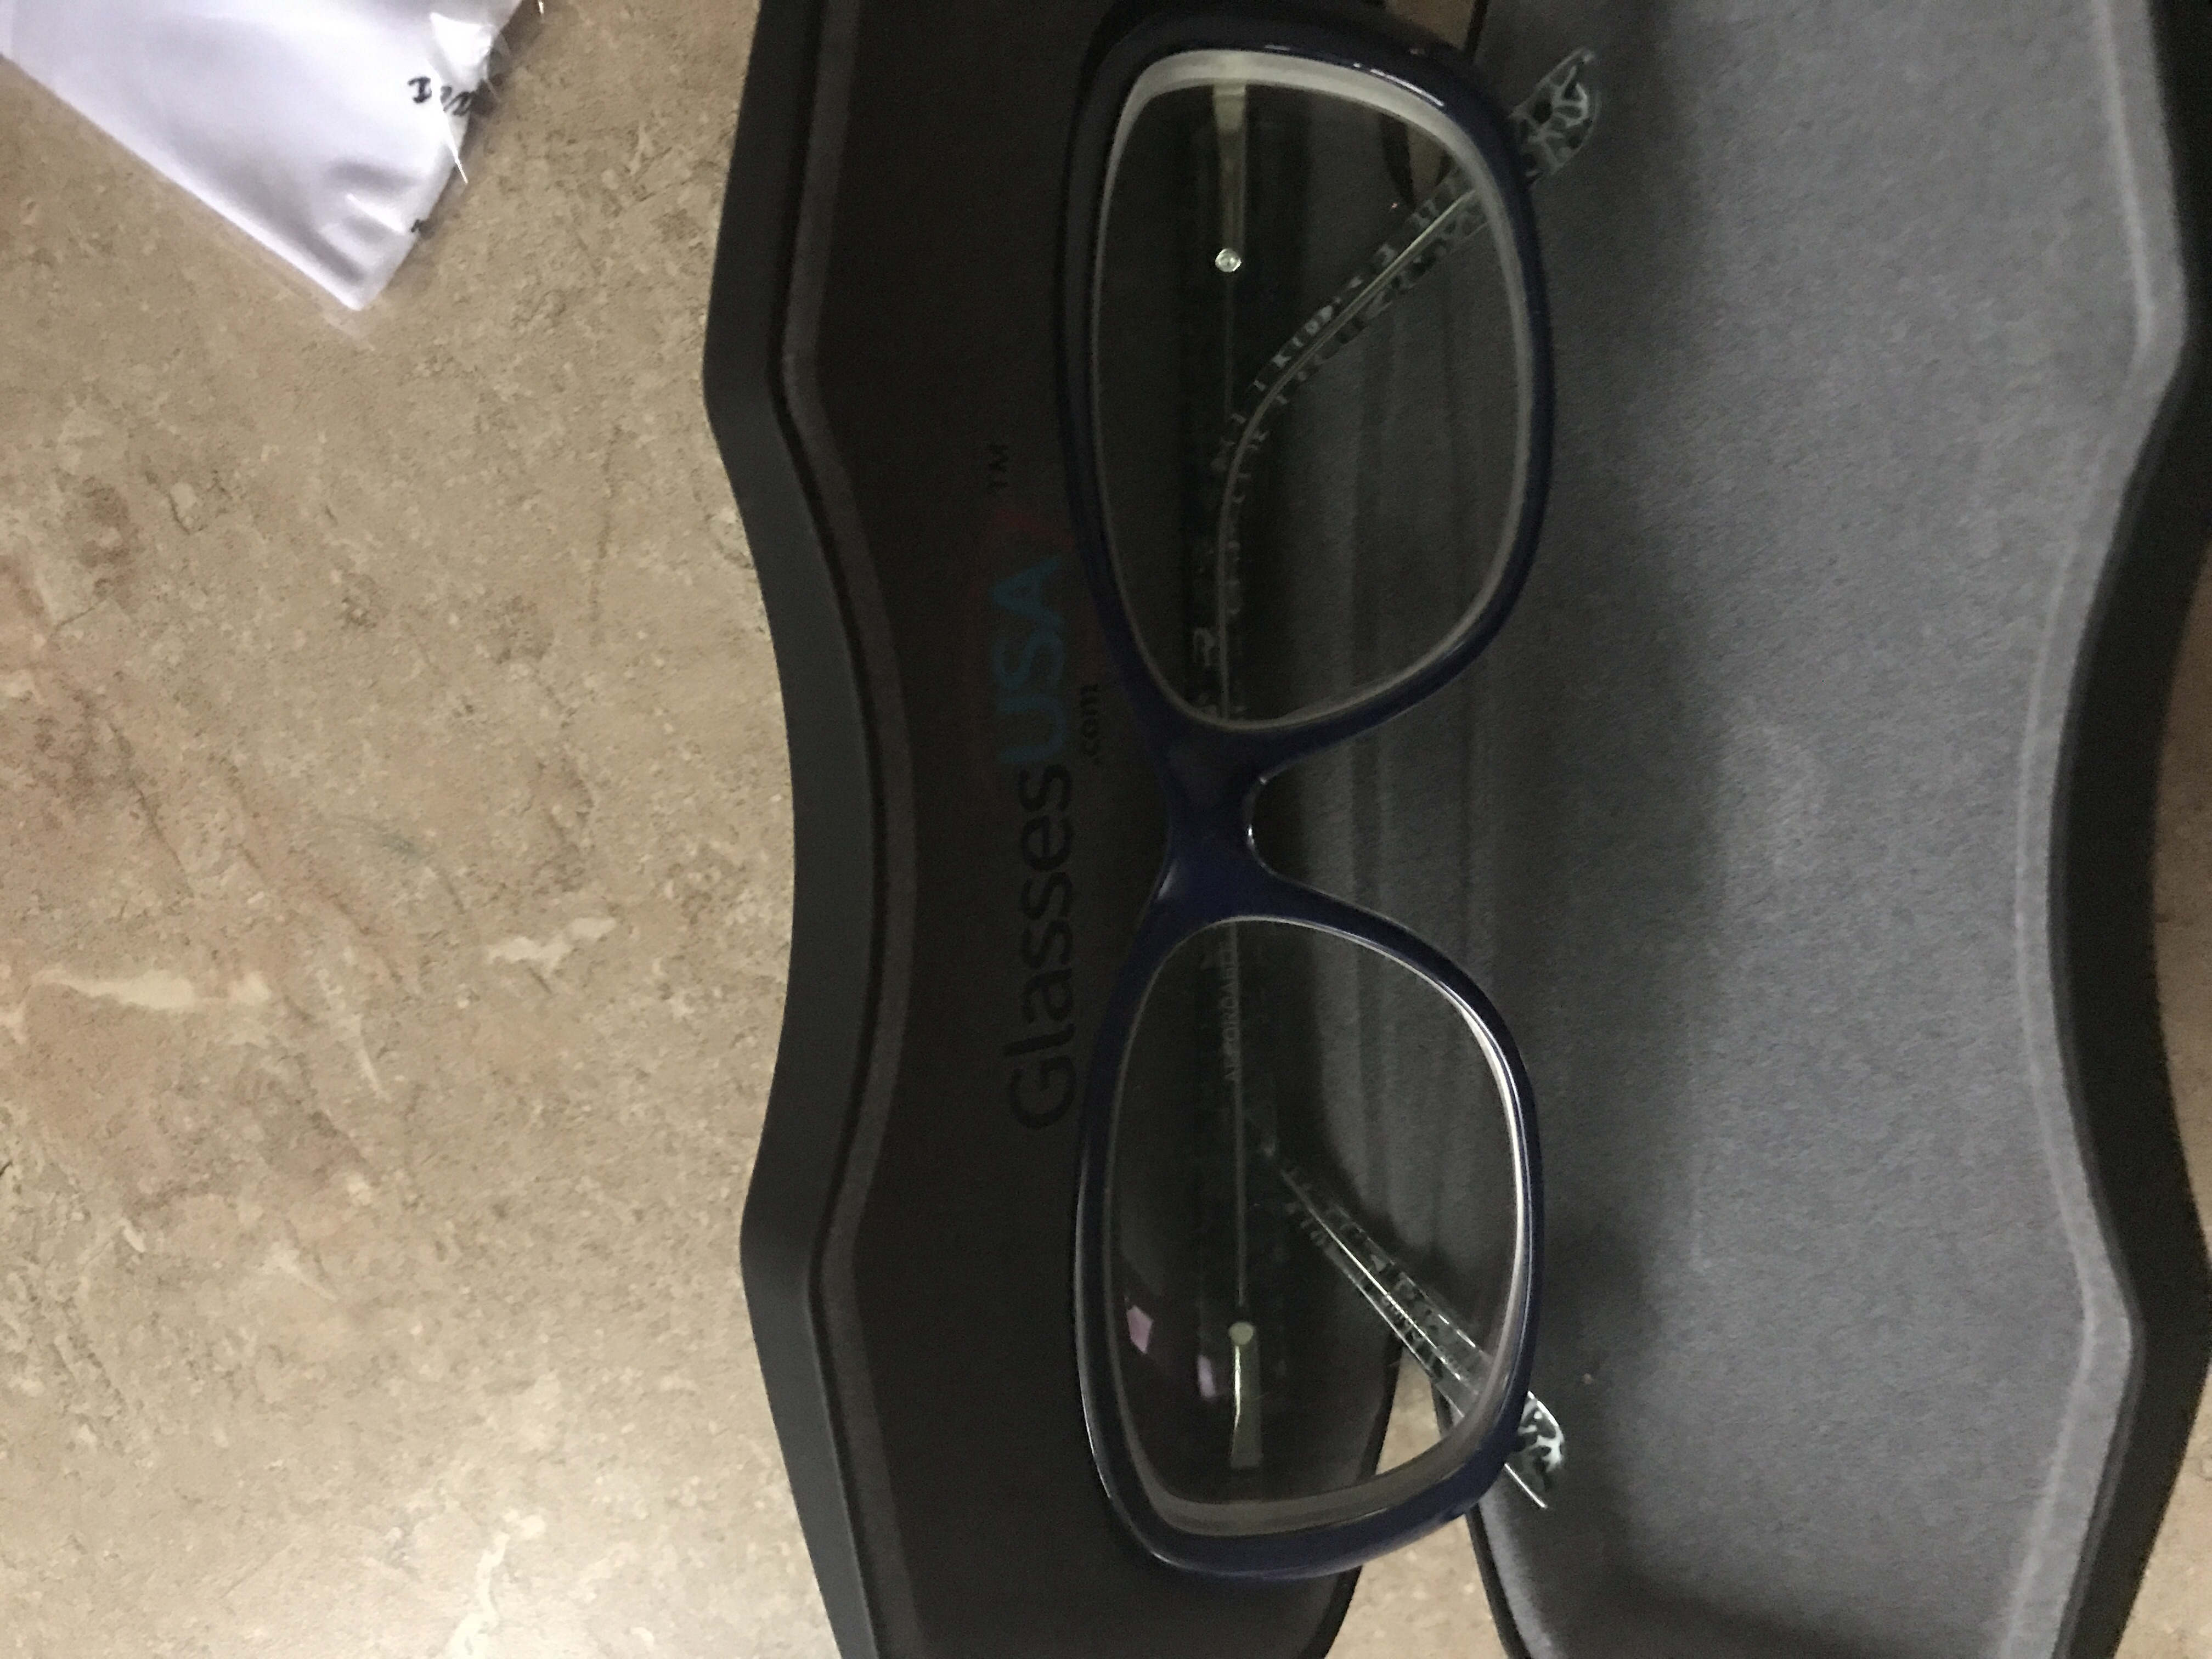 902c7590b52 GlassesUSA Reviews - 2